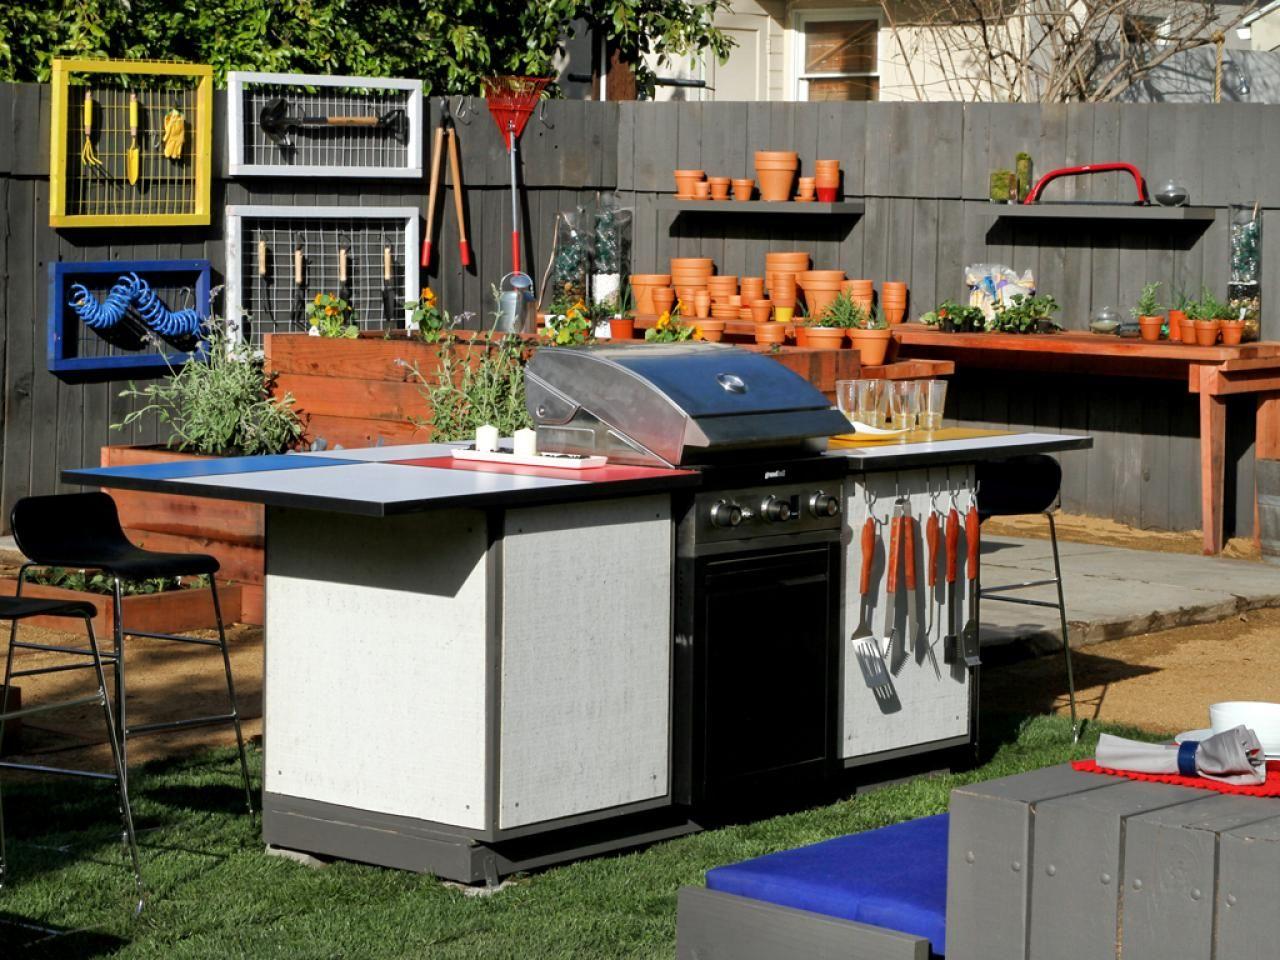 Hot backyard design ideas to try now hgtv - Hot Backyard Design Ideas To Try Now